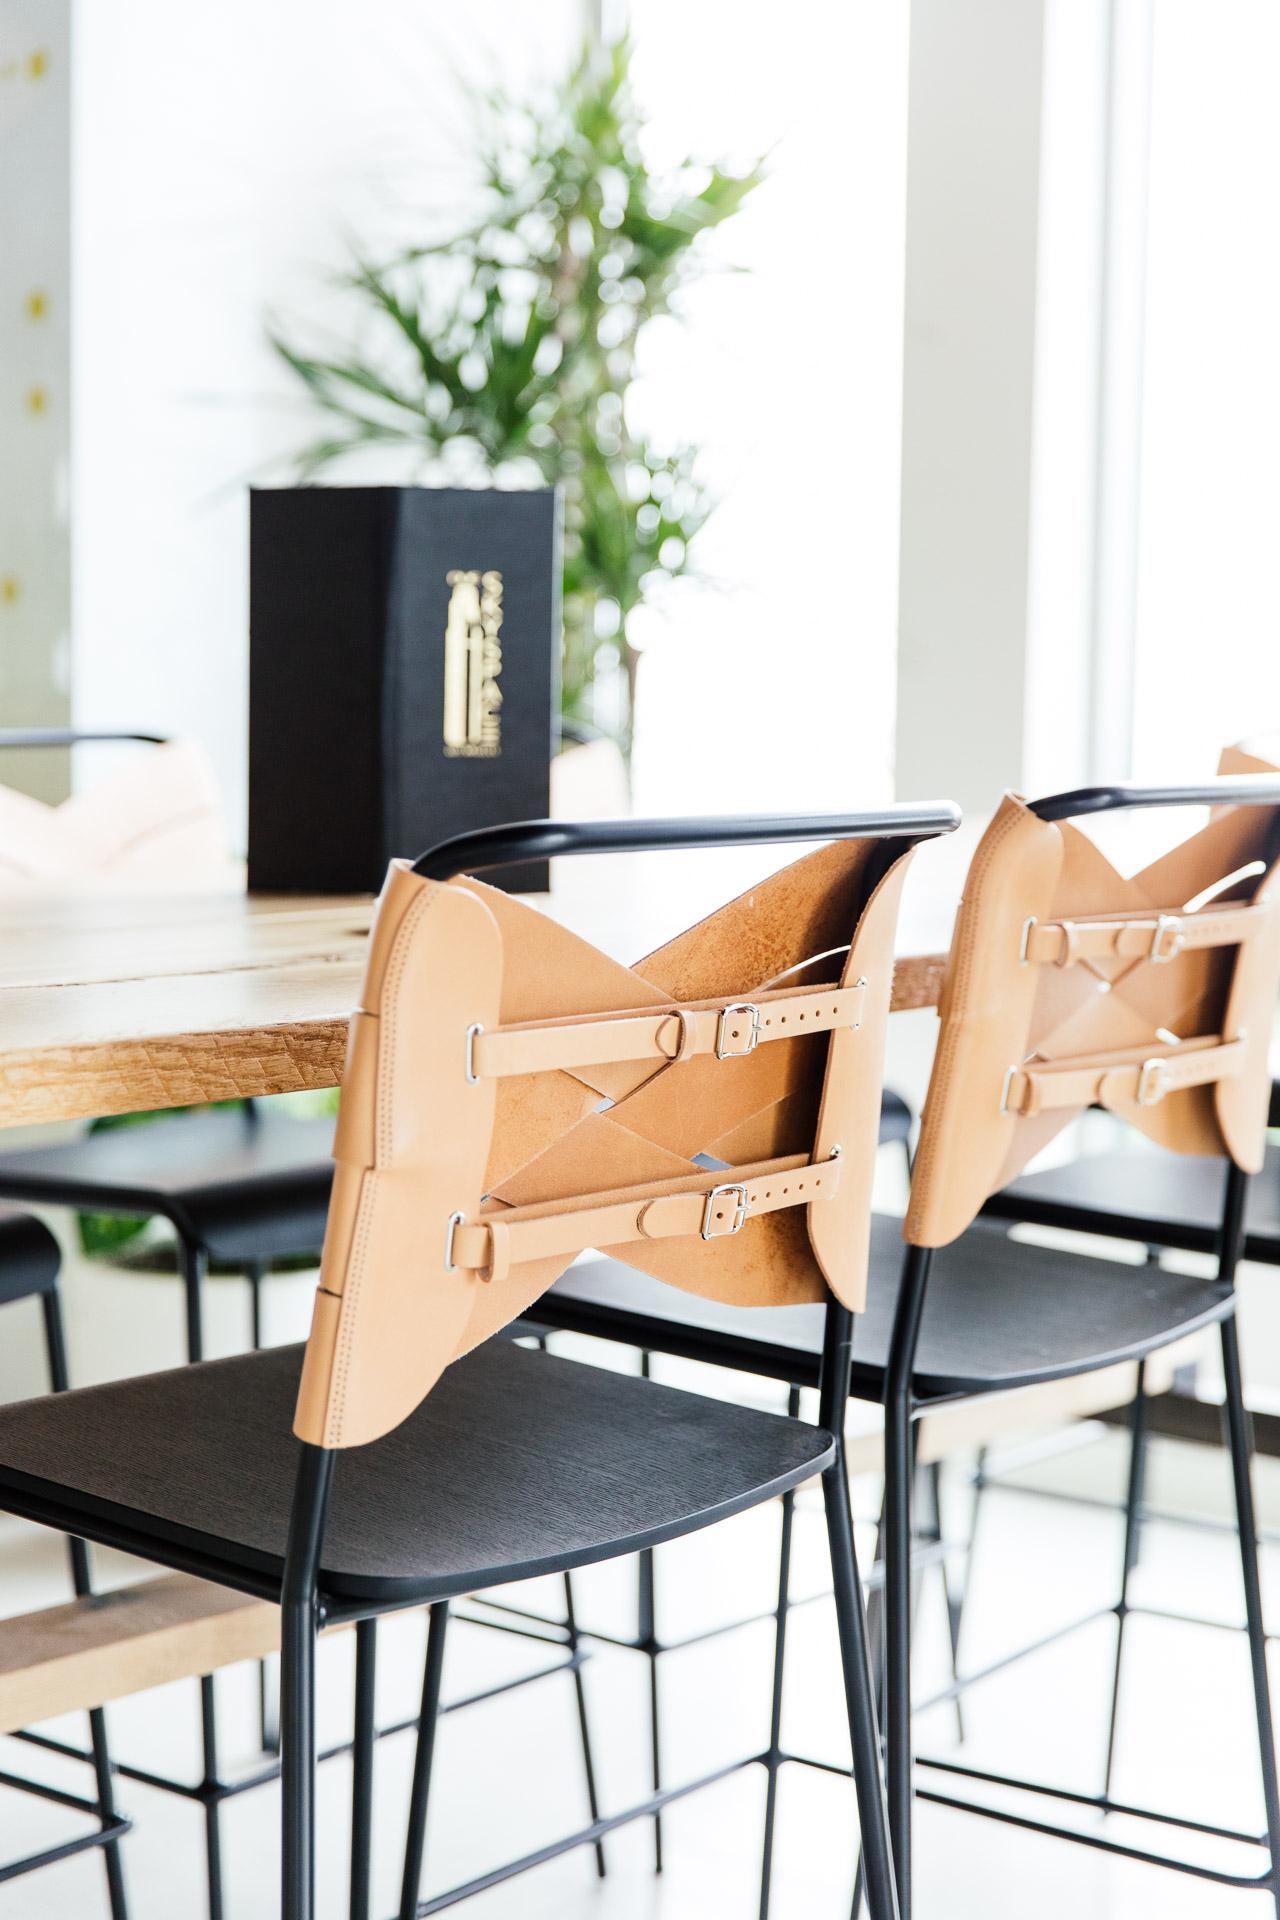 architectural-restaurant-interiors-photographer-los-angeles-oue-skyspace-dtla-2.jpg